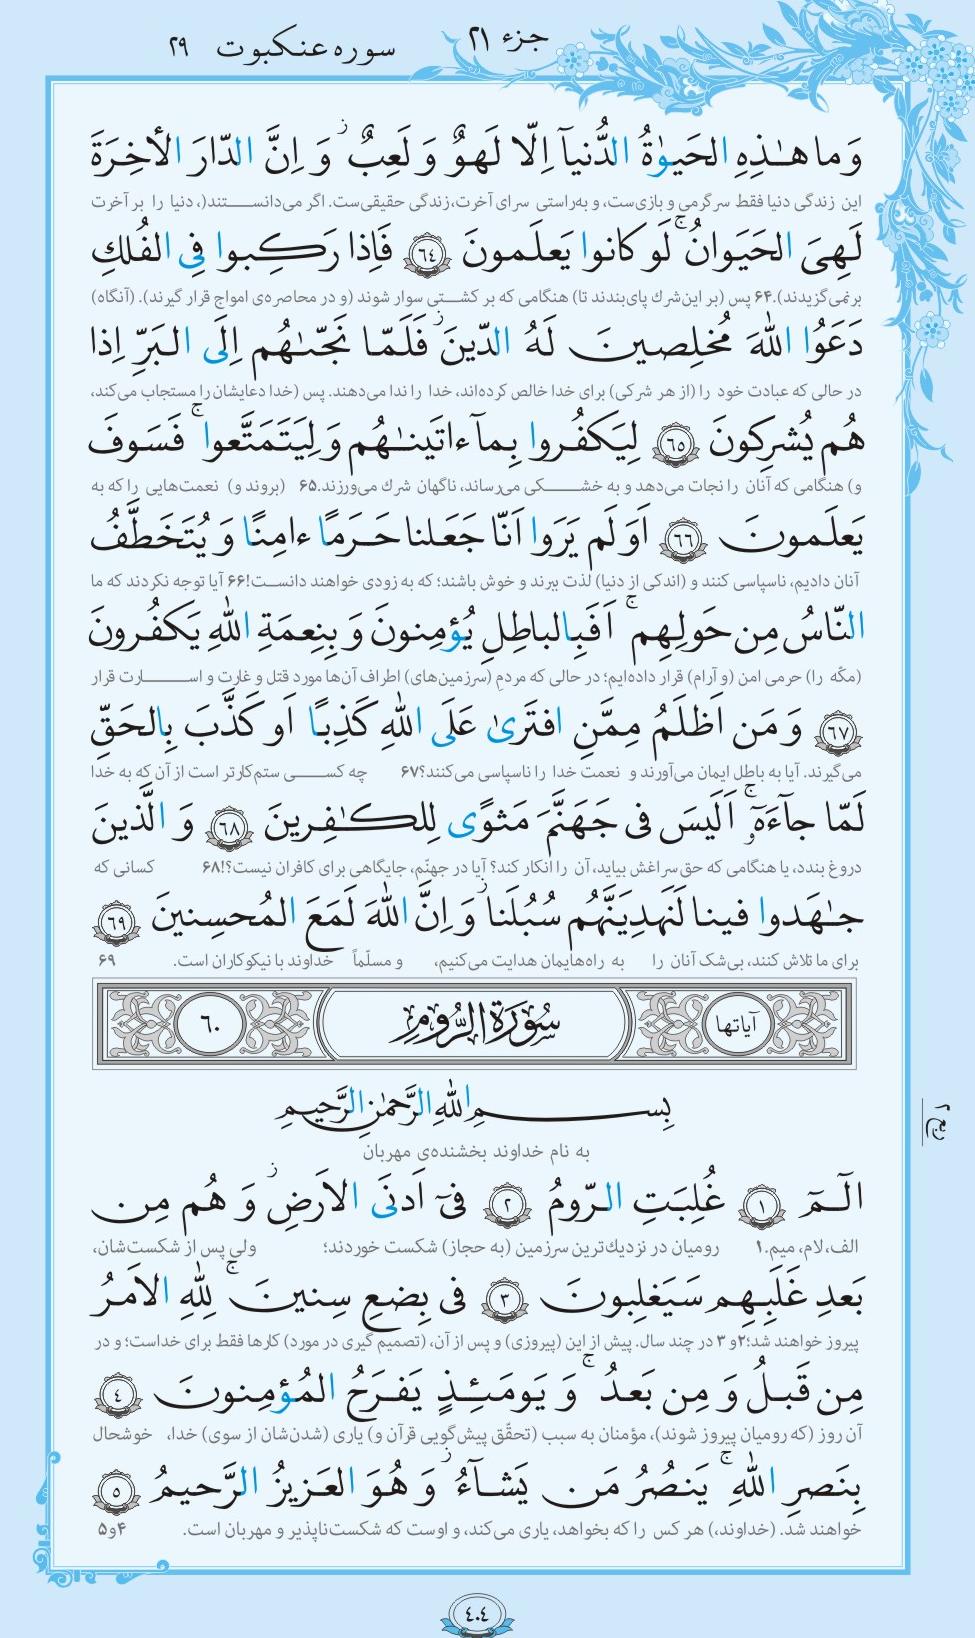 13990407000870 Test NewPhotoFree - ترتیل صفحه ۴۰۴ قرآن باصدای عبدالباسط+صوت و متن